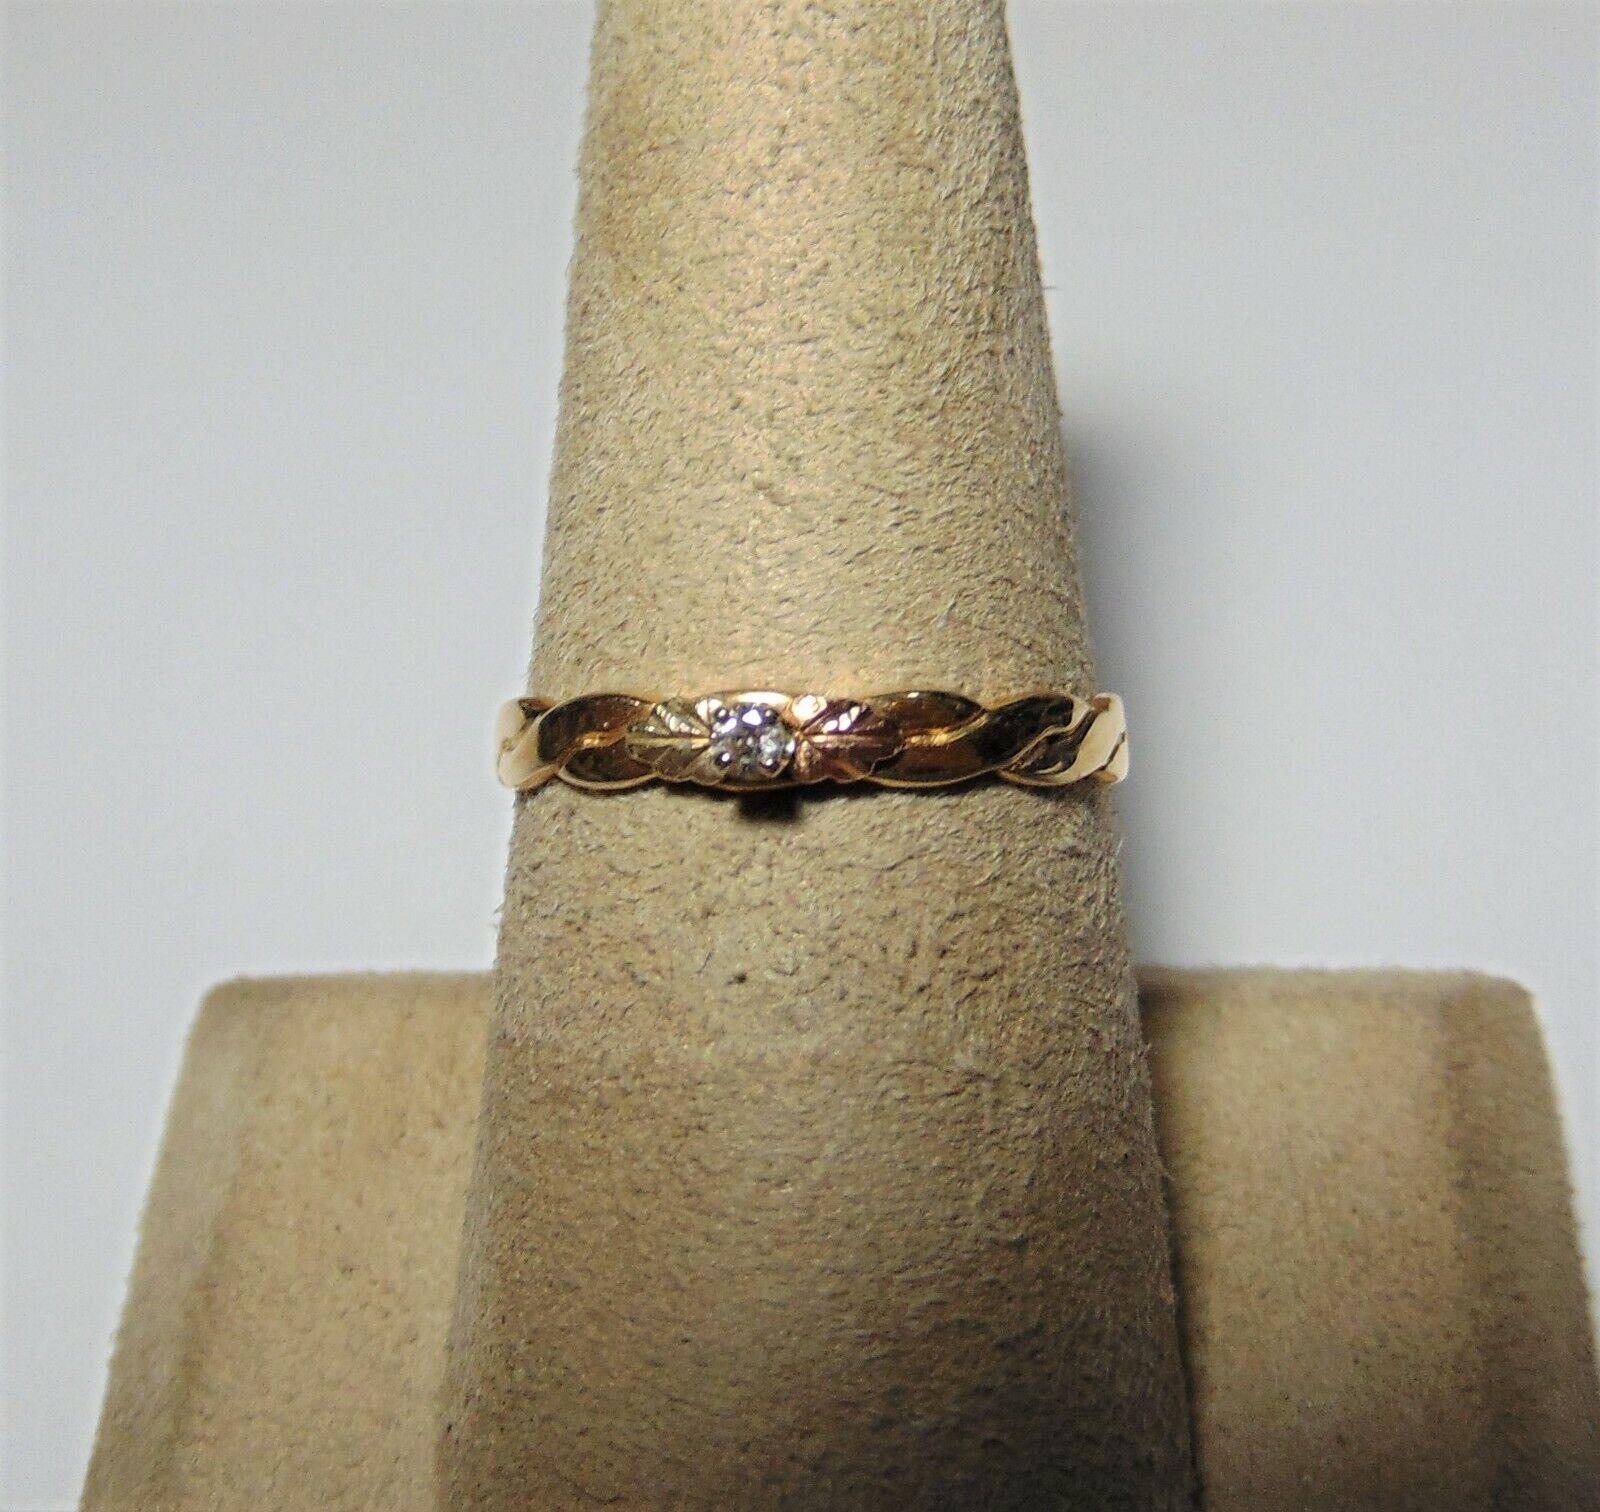 Ladies petite 10K Yellow gold Diamond Ring Size 6.75 G-66-M